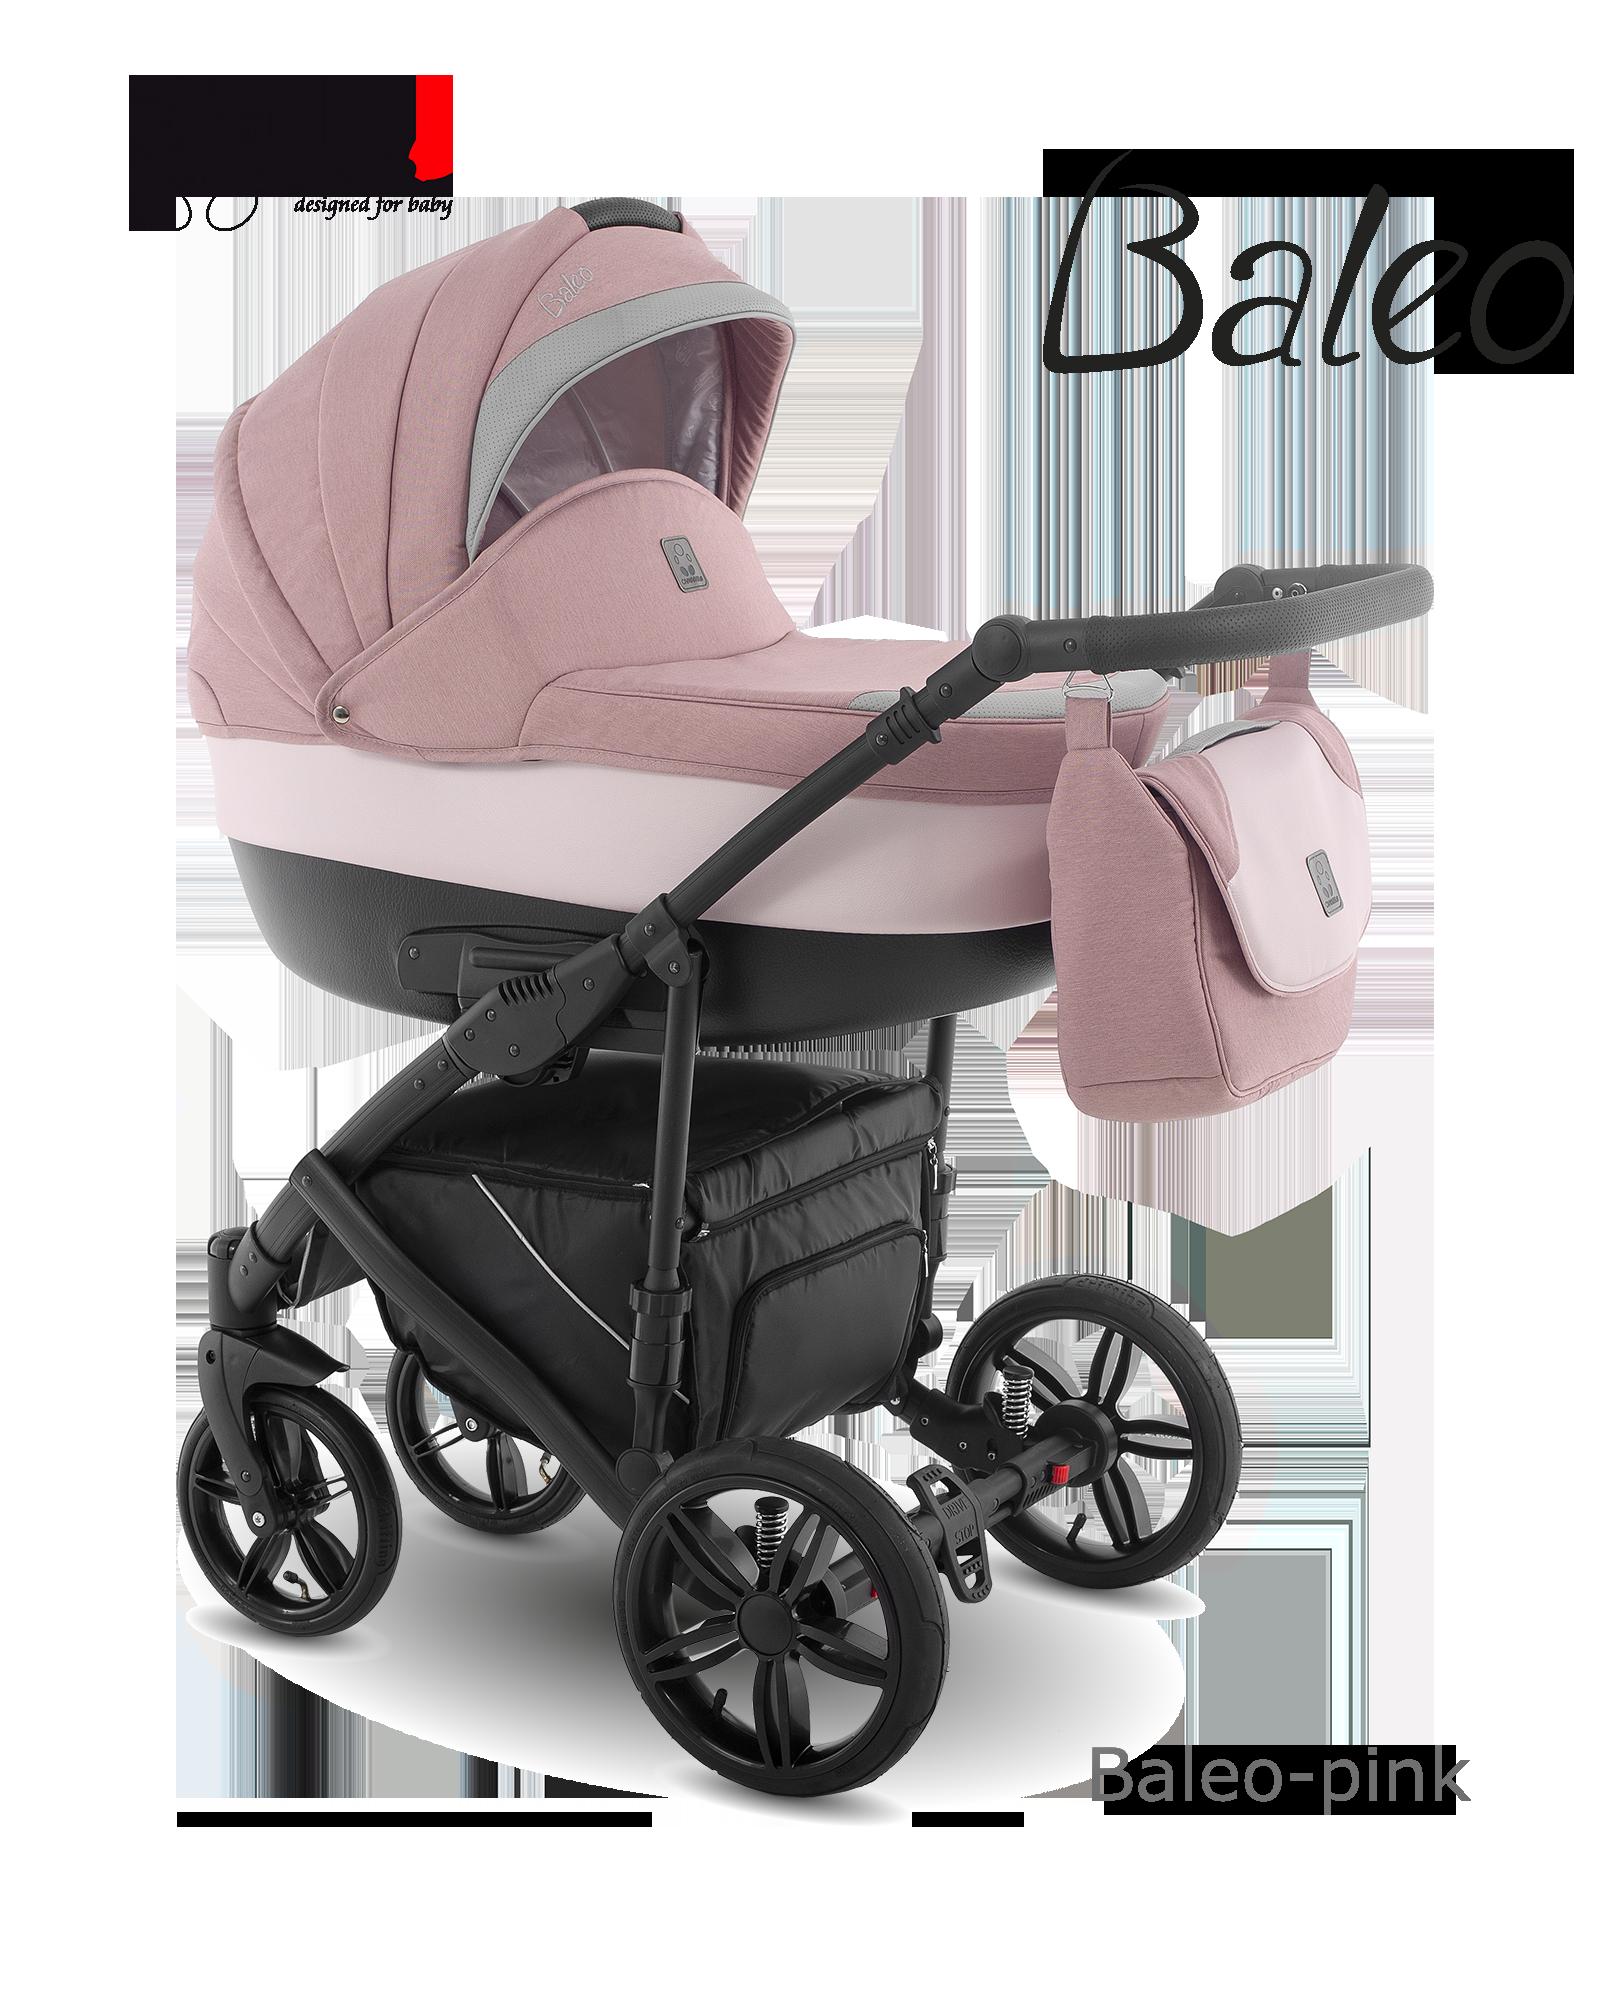 Baleo-pink-a